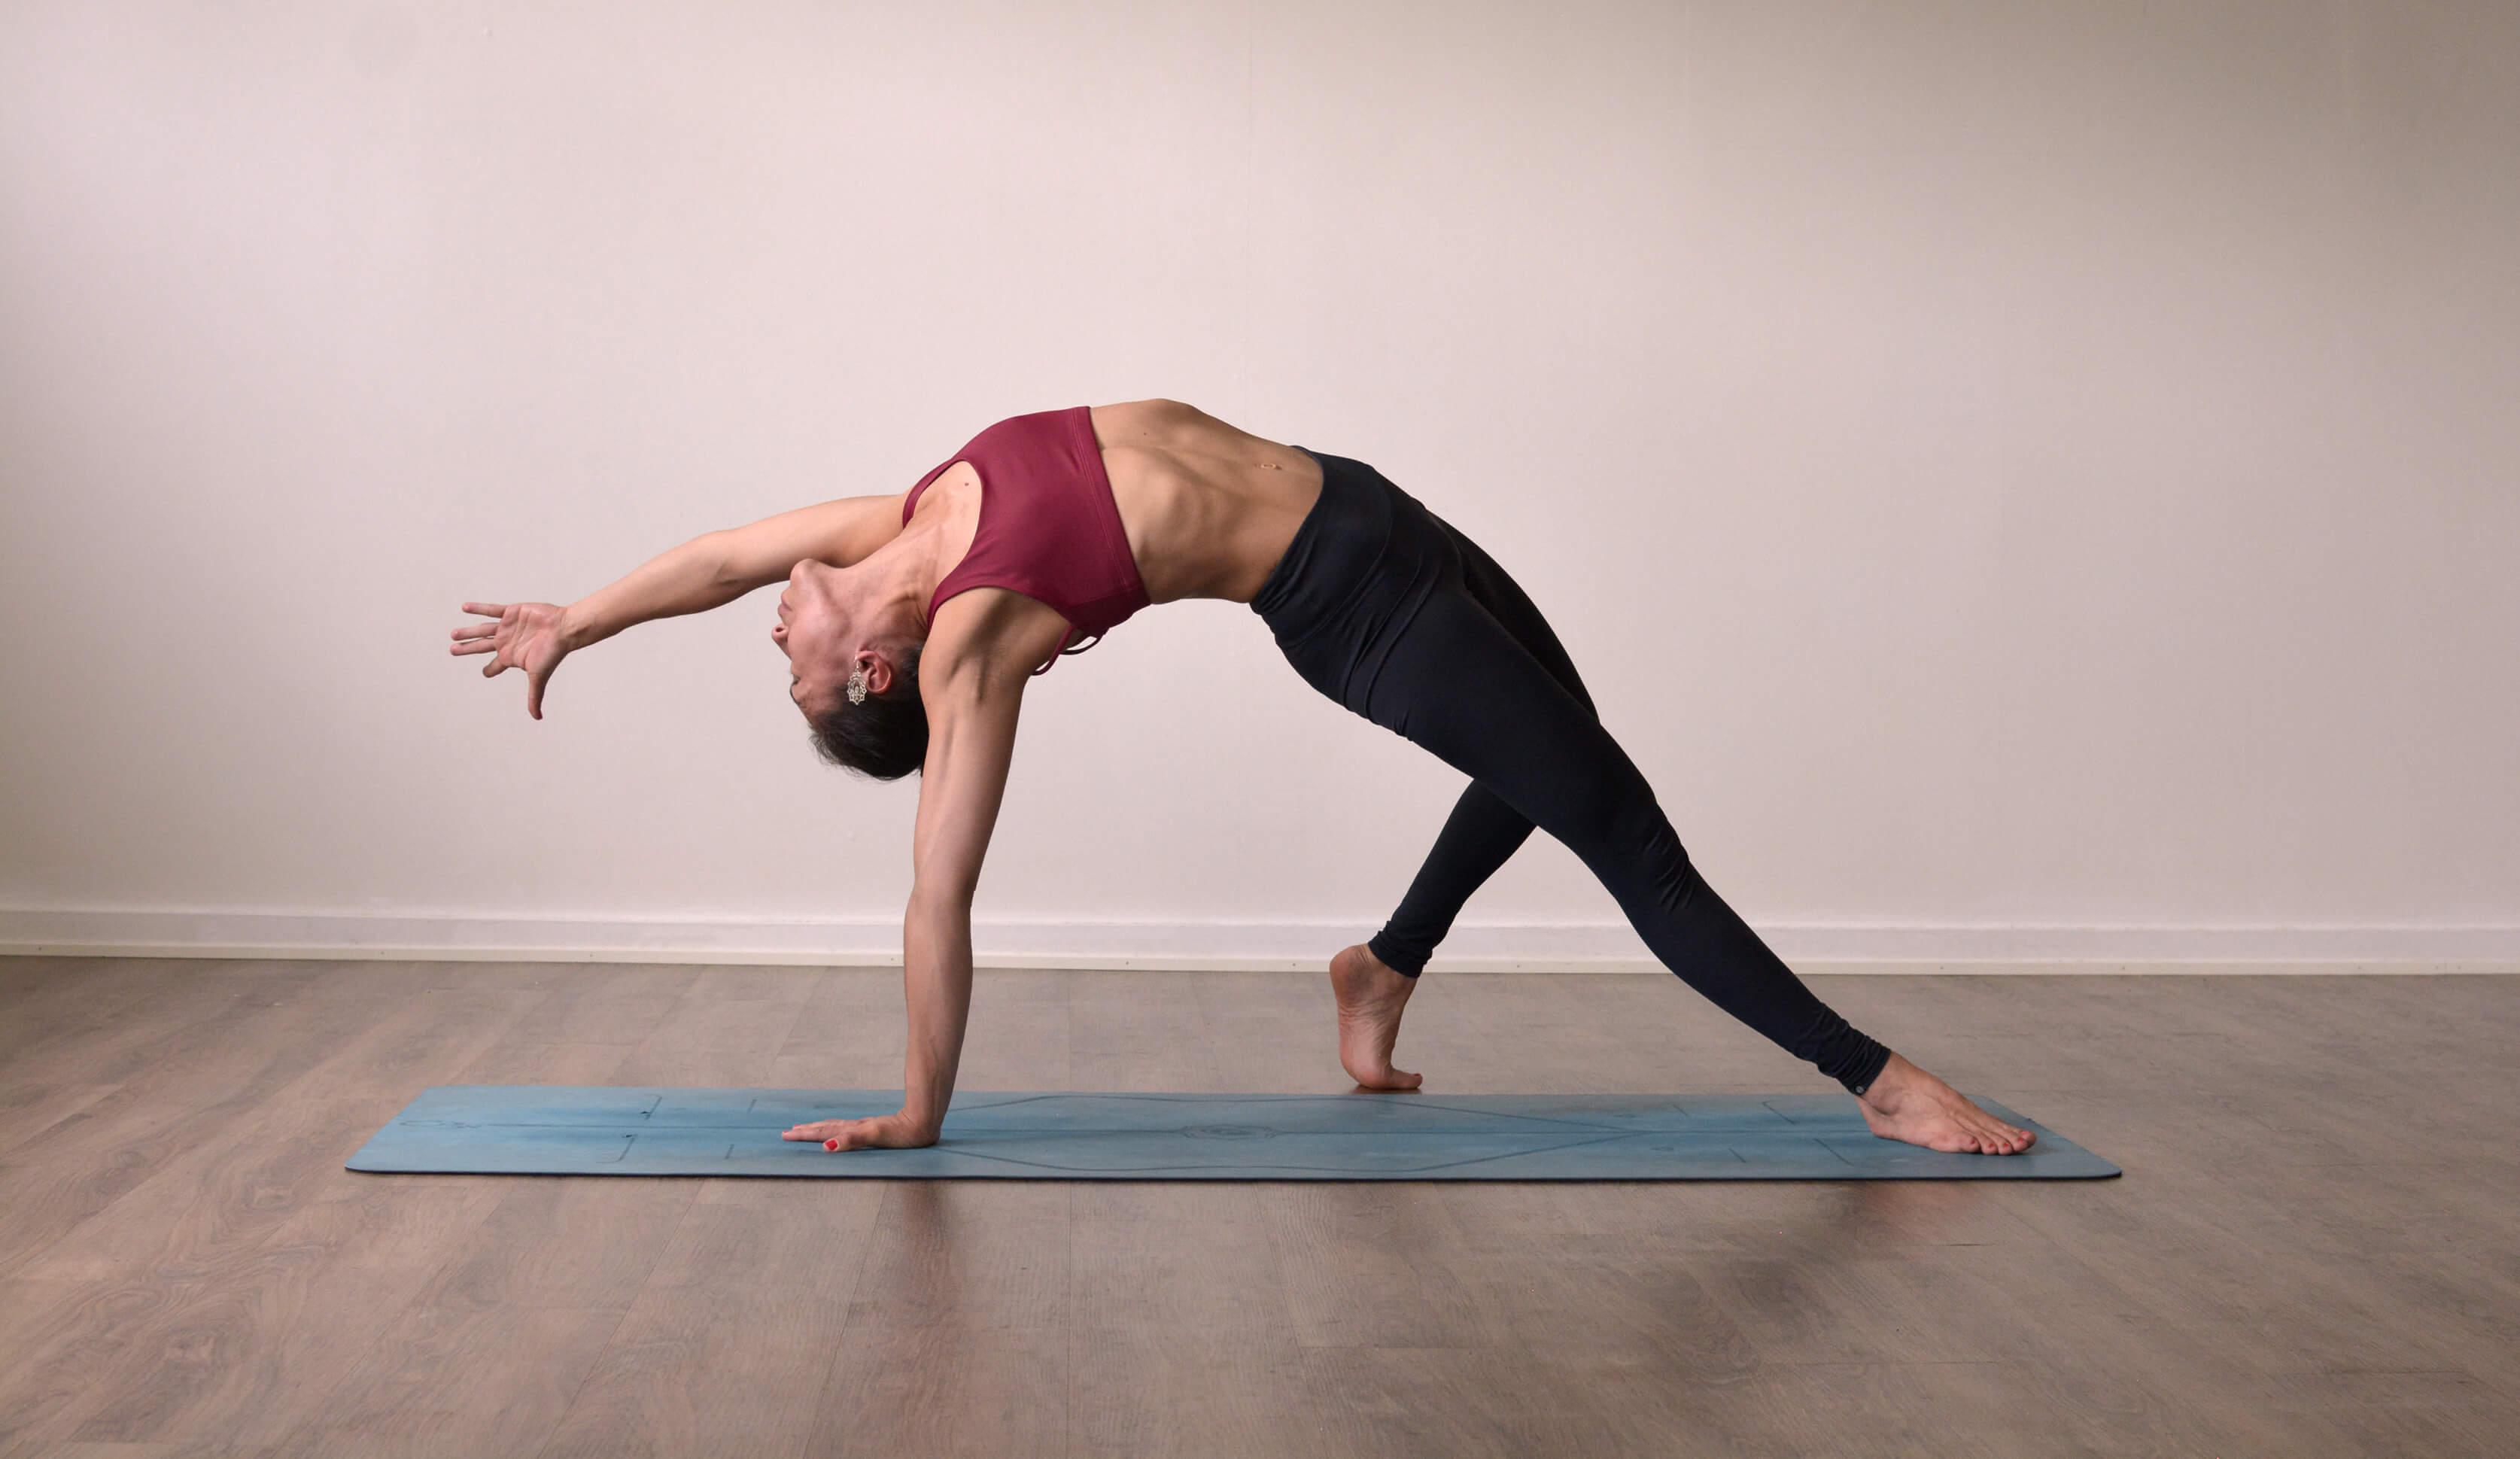 Yogakurser Uppsala - Utbud yoga - Hot Yoga Uppsala 987ad59df7019